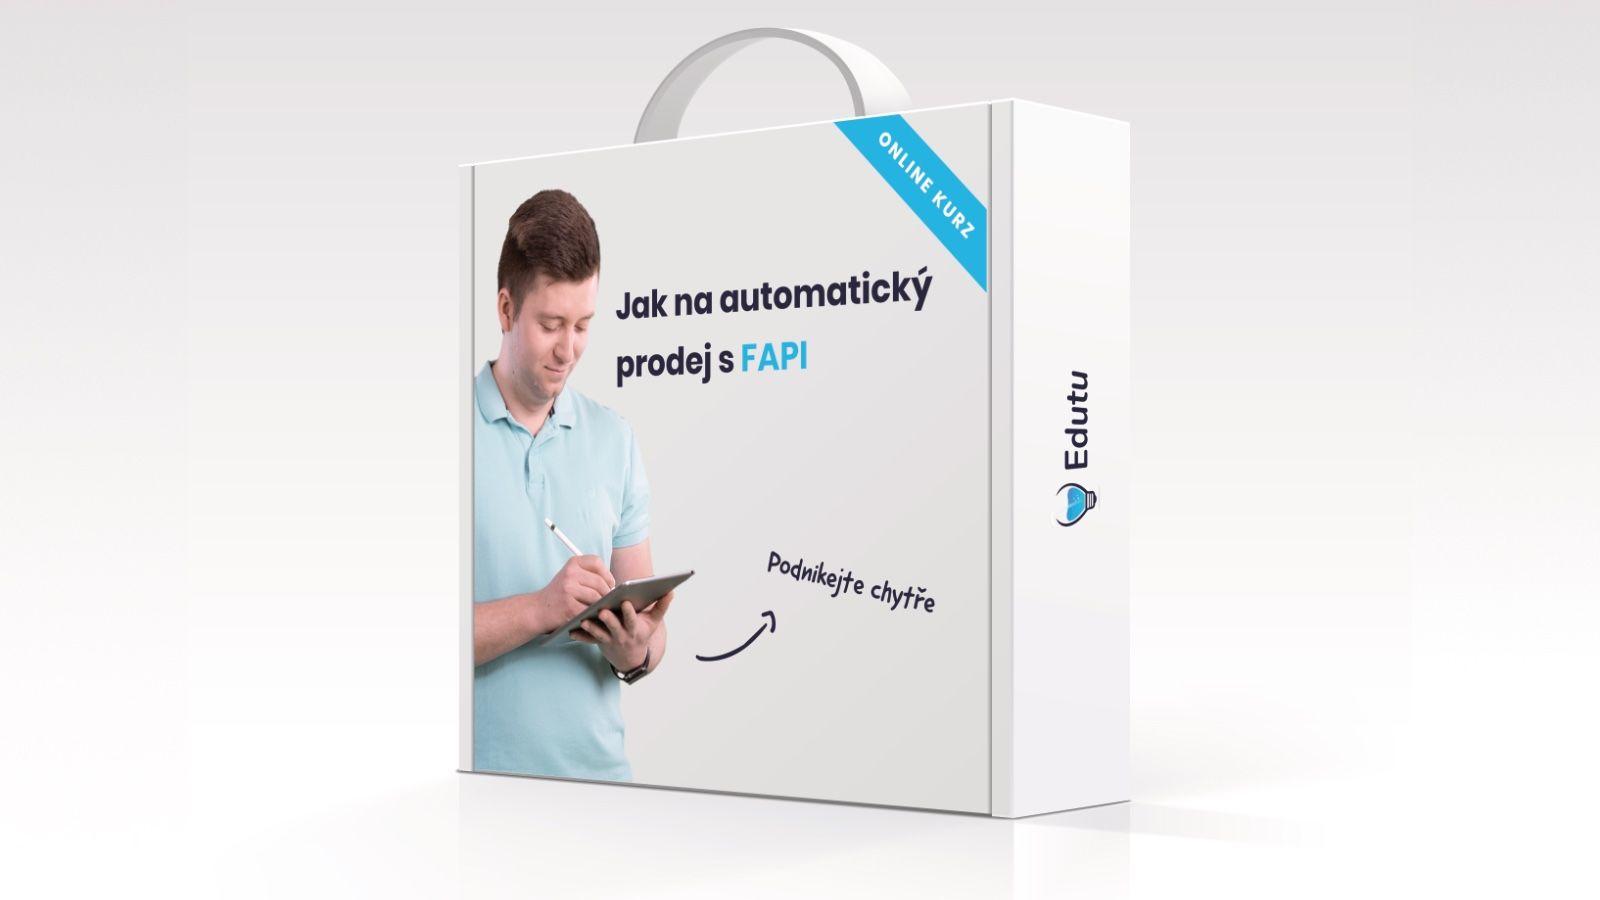 Online kurz Jak naautomatický prodej sFAPI